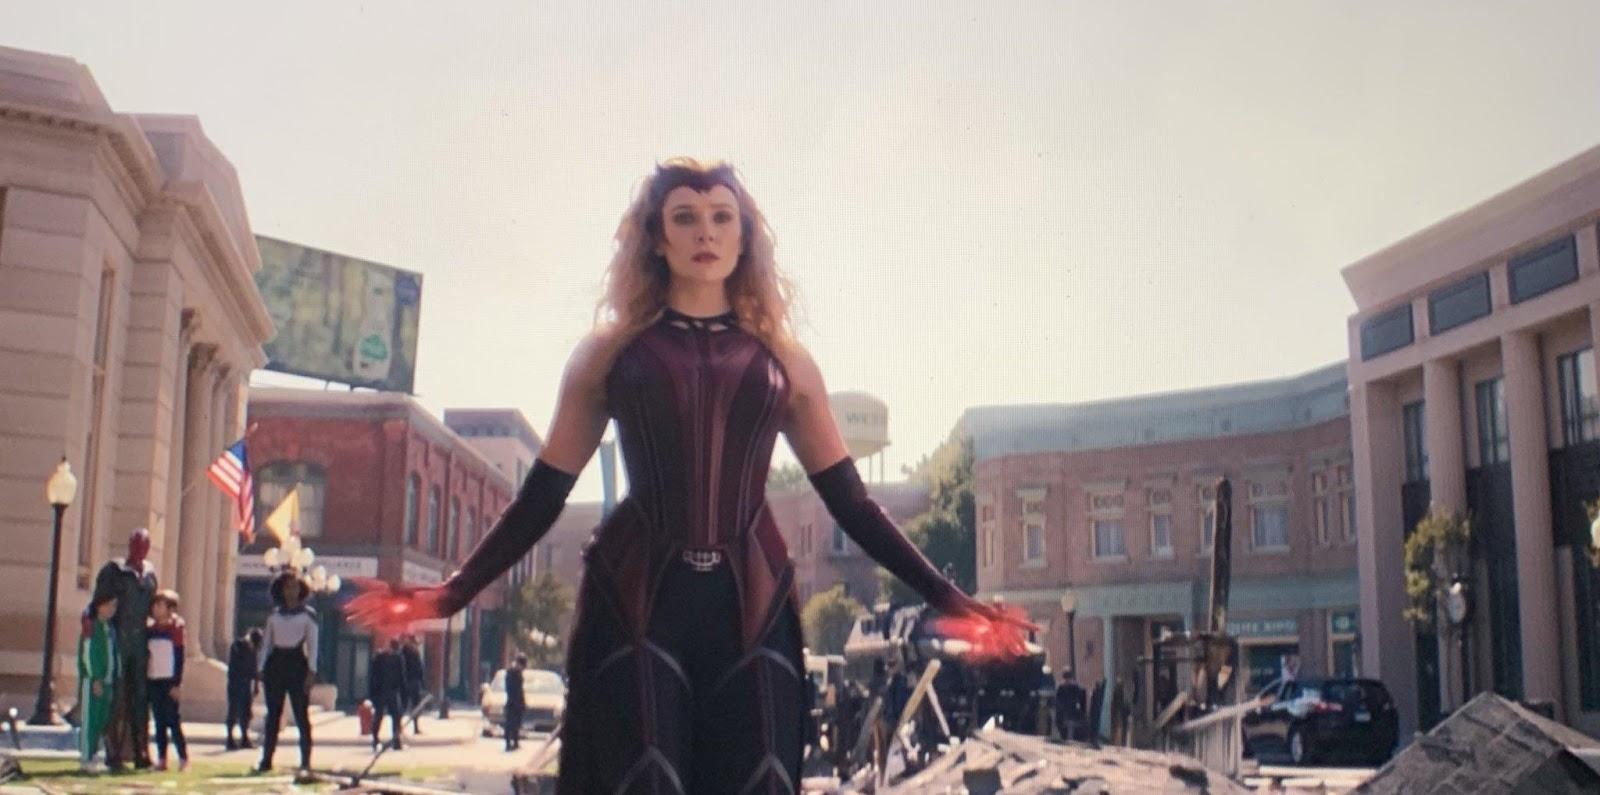 Wanda Maximoff gets a proper costume in WandaVision episode 9 - The Fanboy  SEO